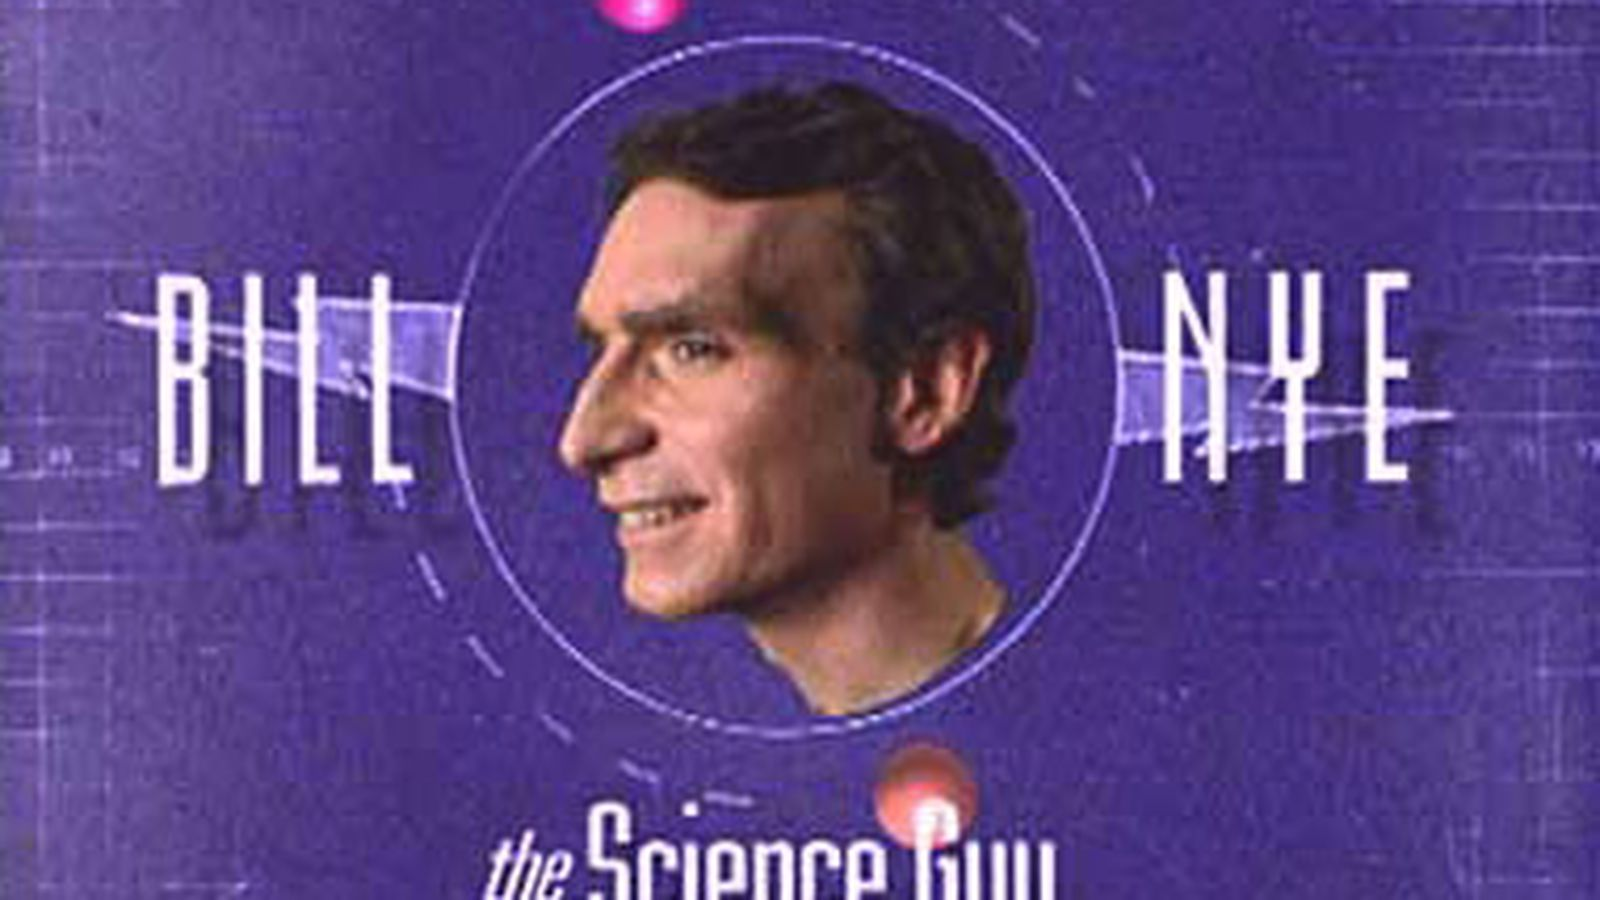 Bill Nye Teases The Return Of Bill Nye The Science Guy